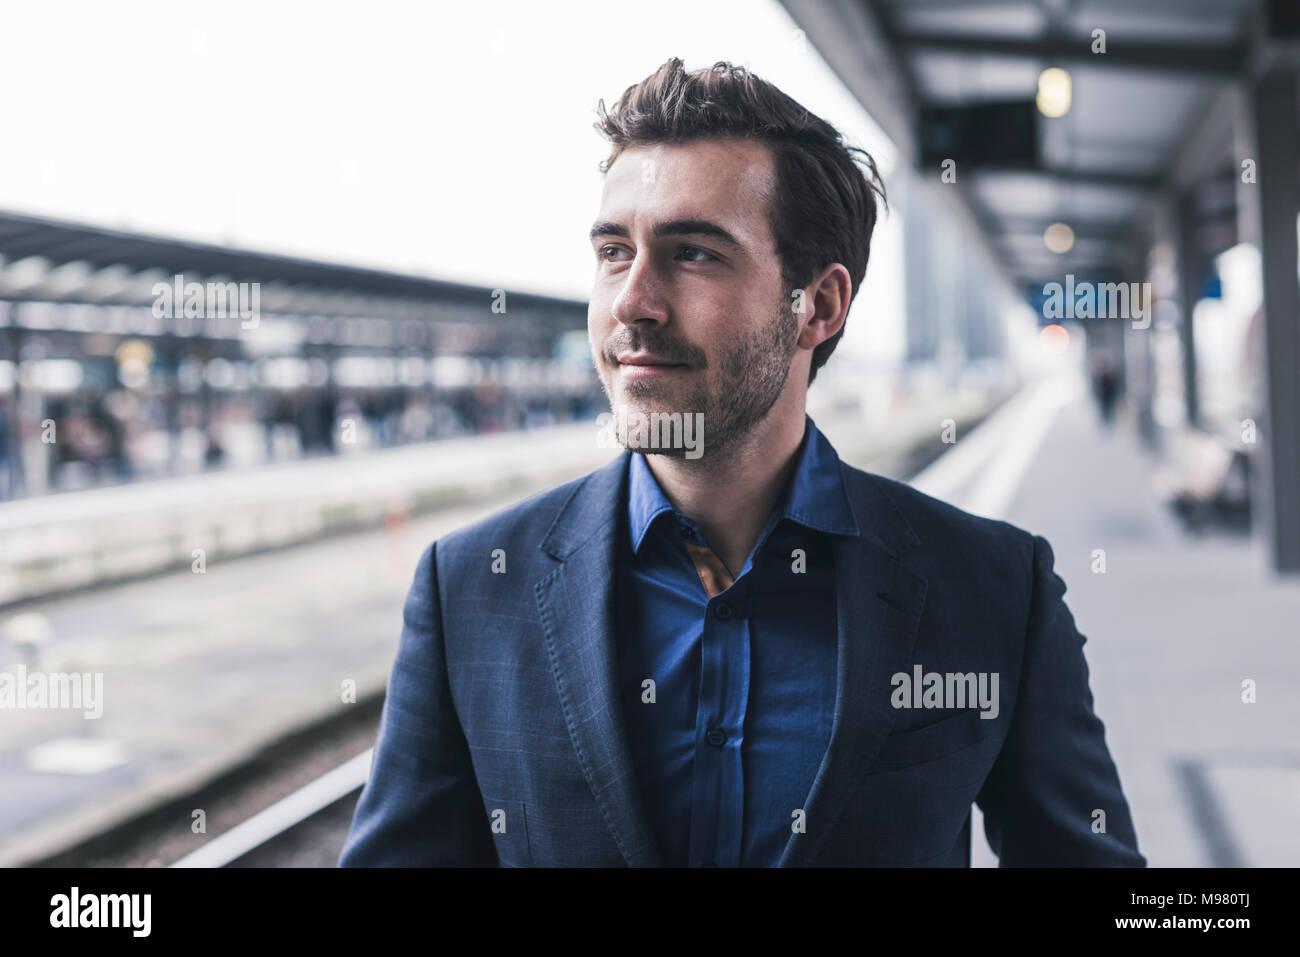 Young businessman waiting at station platform - Stock Image